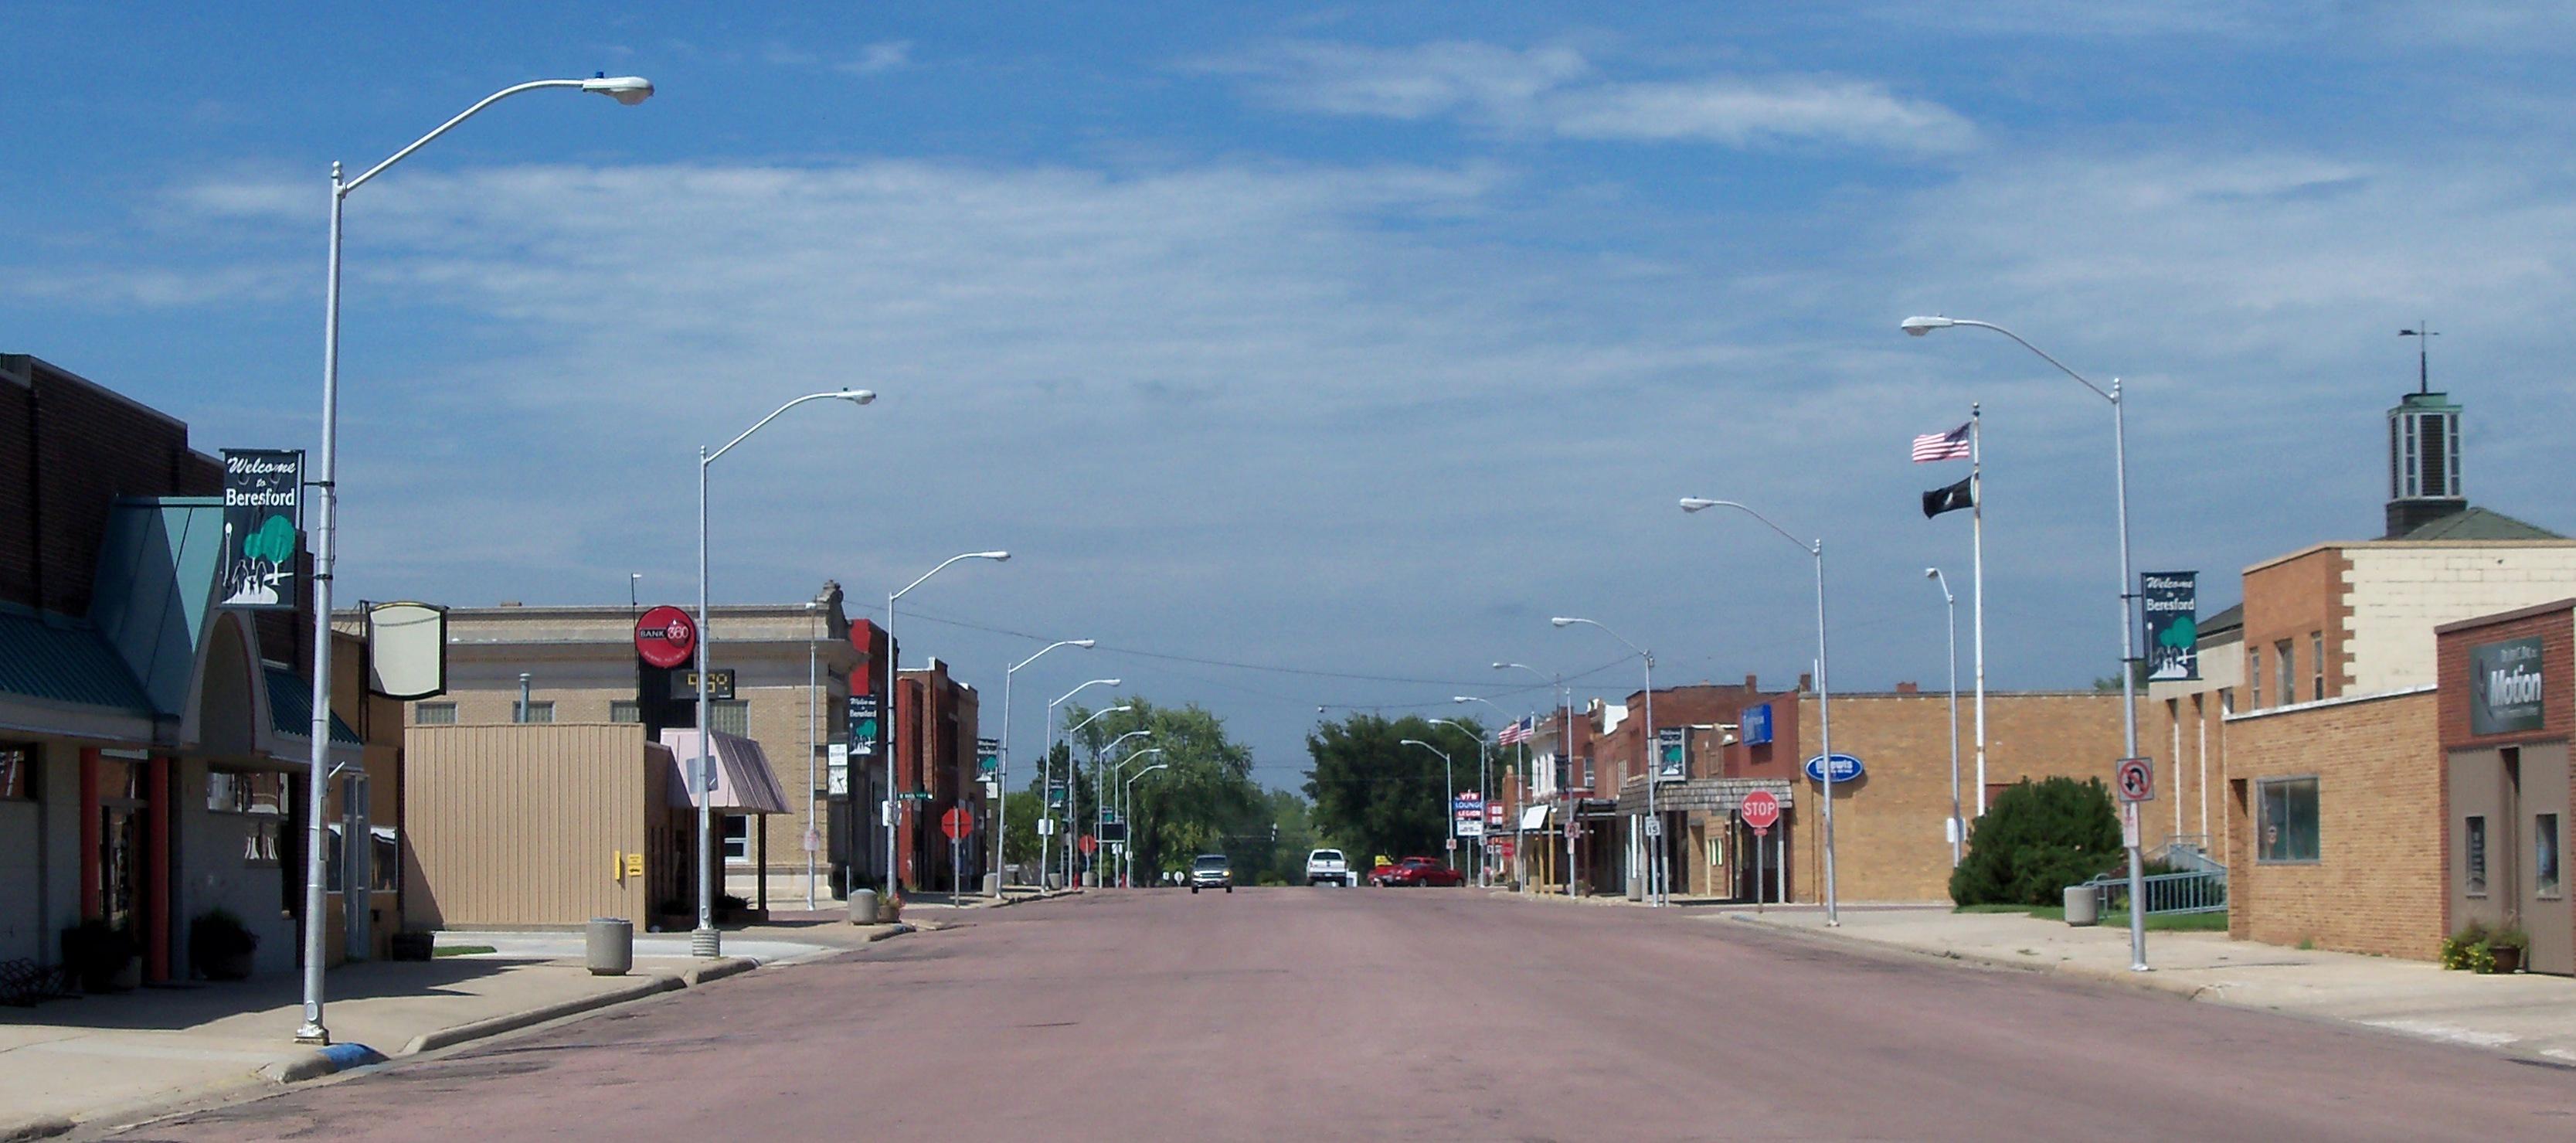 Adult singles dating beresford south dakota